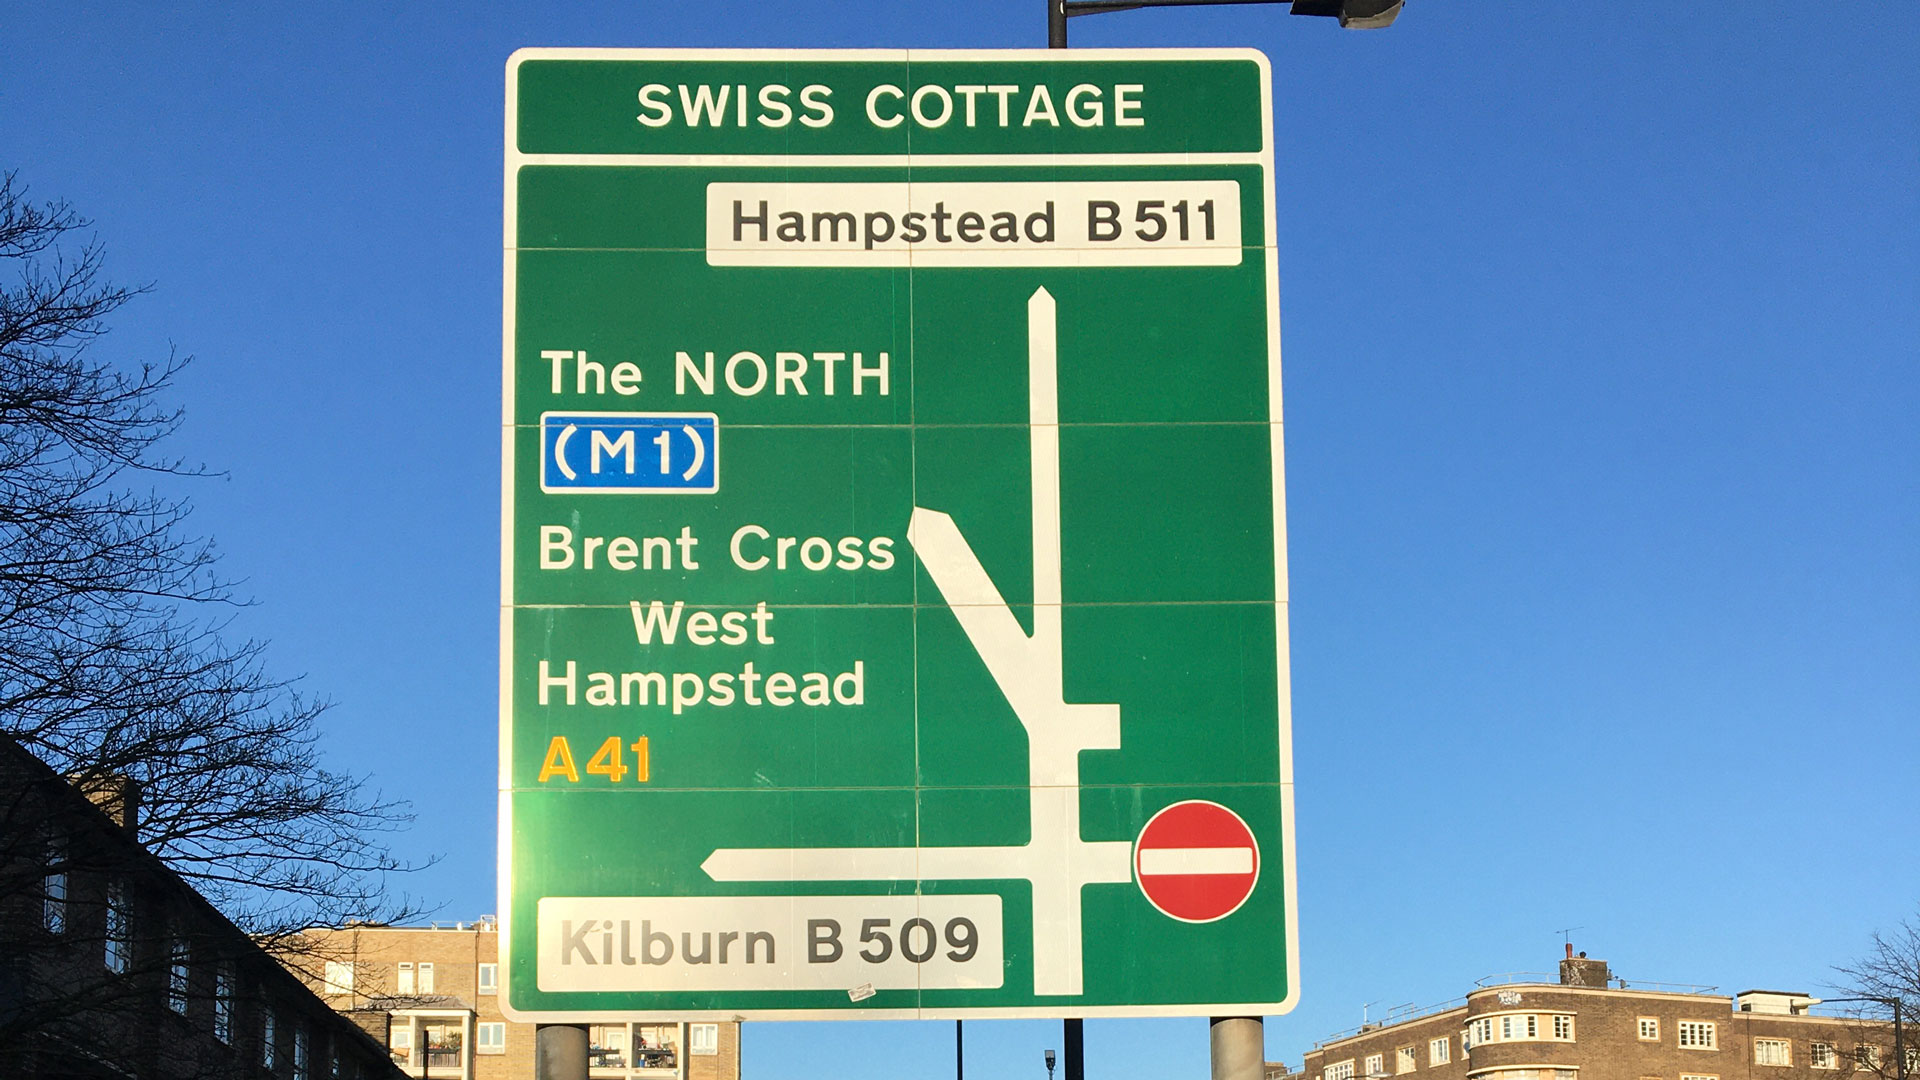 Swizz Cottage Road Sign show A Roads, B Roads & Motorway